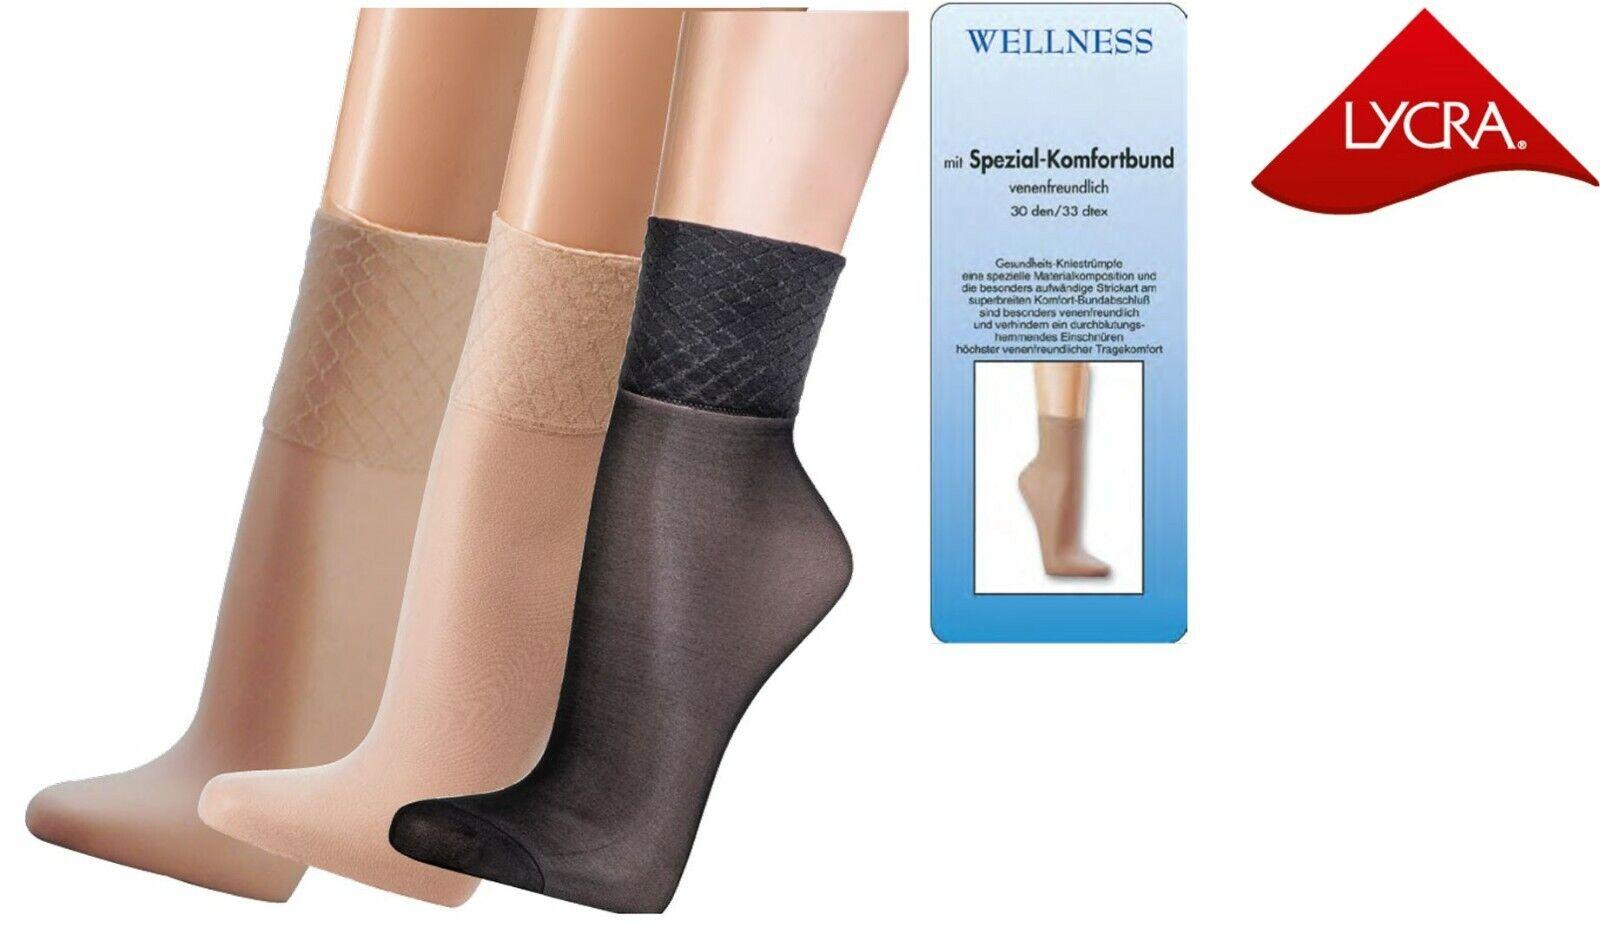 5,10 Paar Wellness Feinsöckchen Spezial Komfortbund ohne Gummidruck Socken 30den